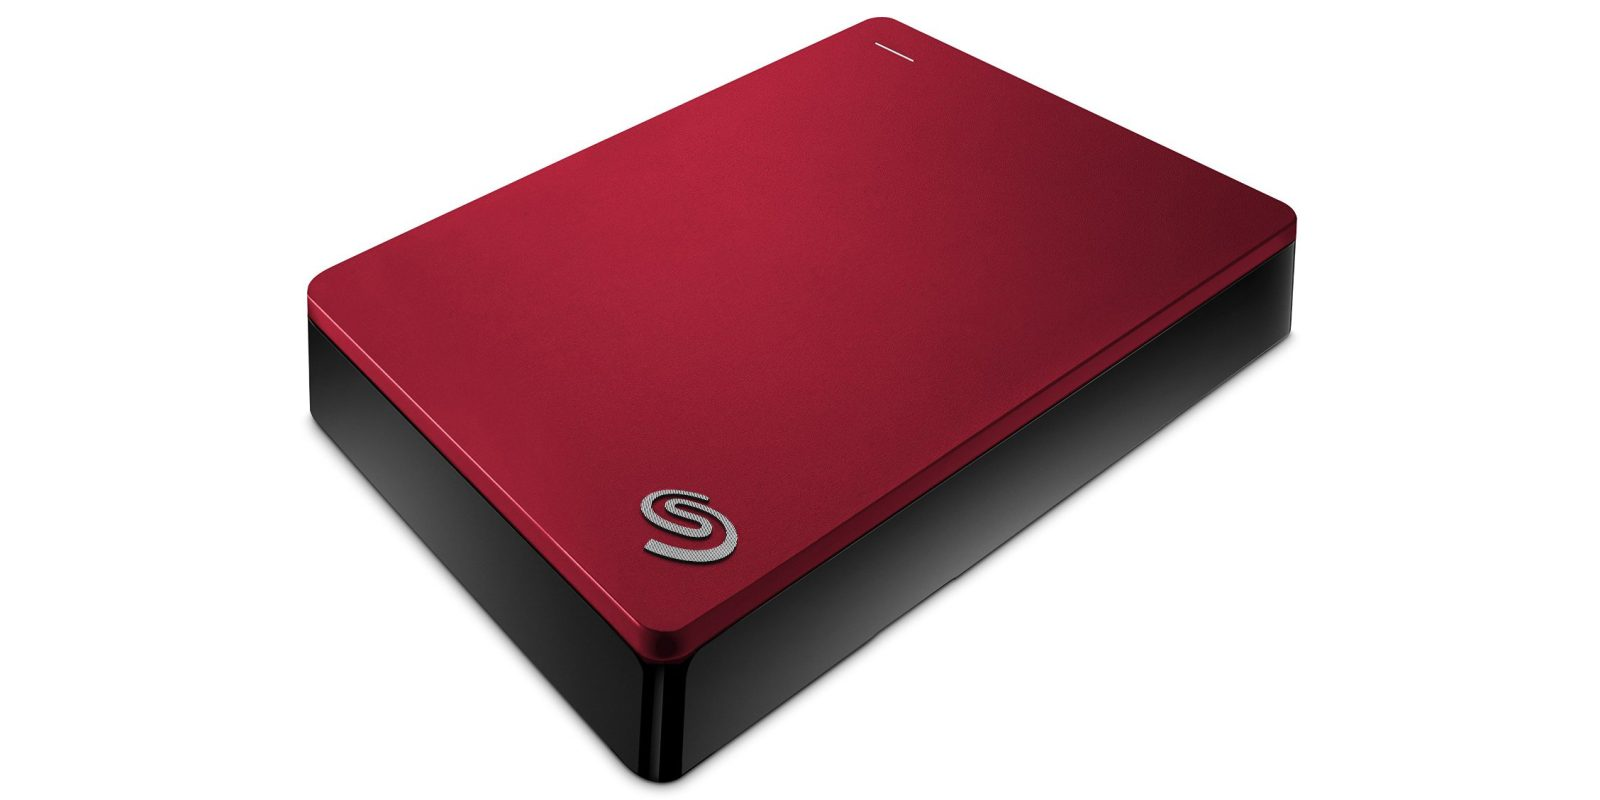 Storage Seagate 4tb Usb 30 Portable Hard Drive 110 Reg 130 Backup Plus Slim 1tb Red Sandisk 240gb 25 Ssd 65 75 More